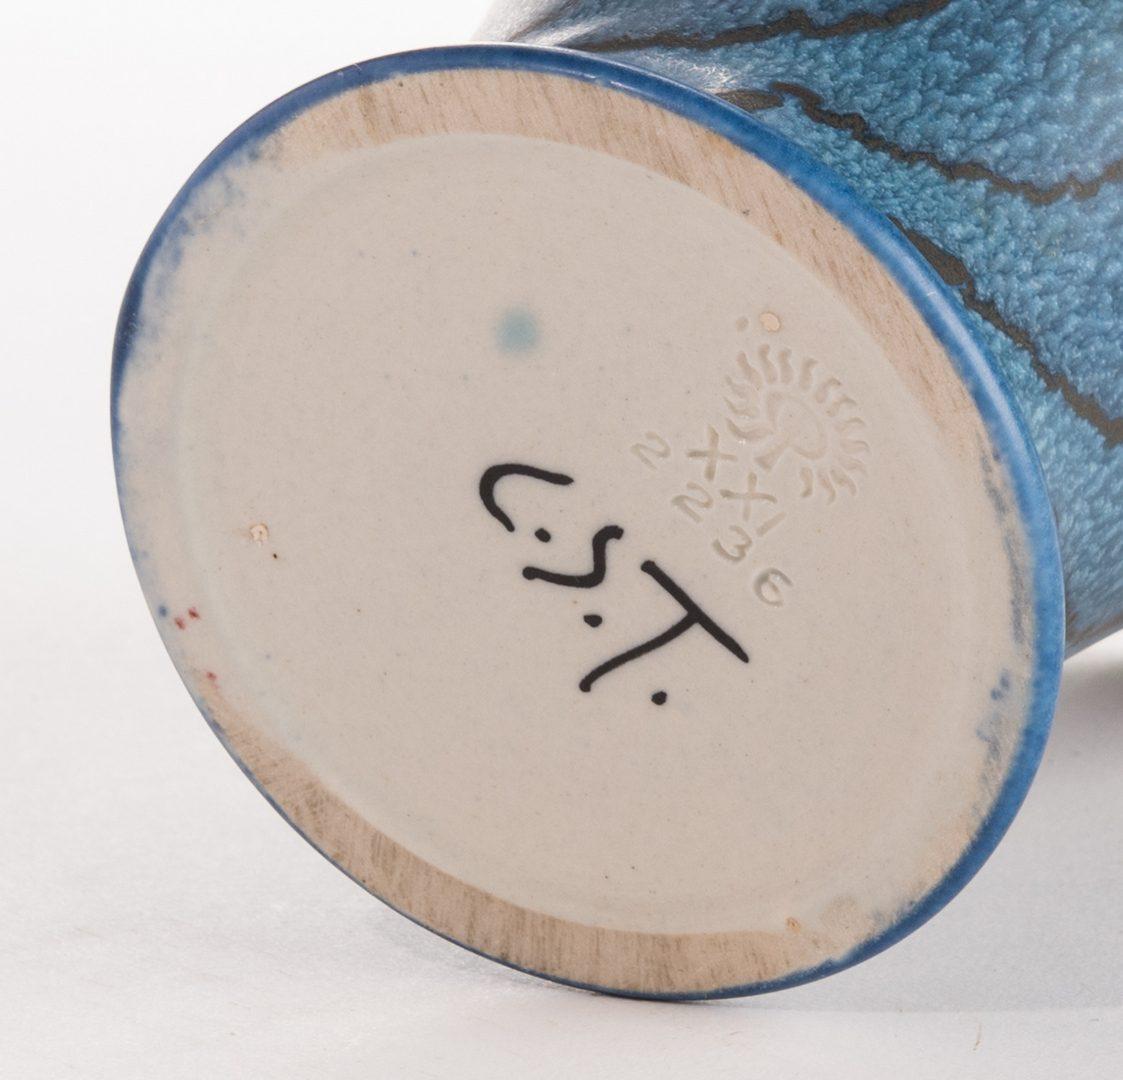 Lot 521: Rookwood Vase, Charles Stewart Todd, 1921